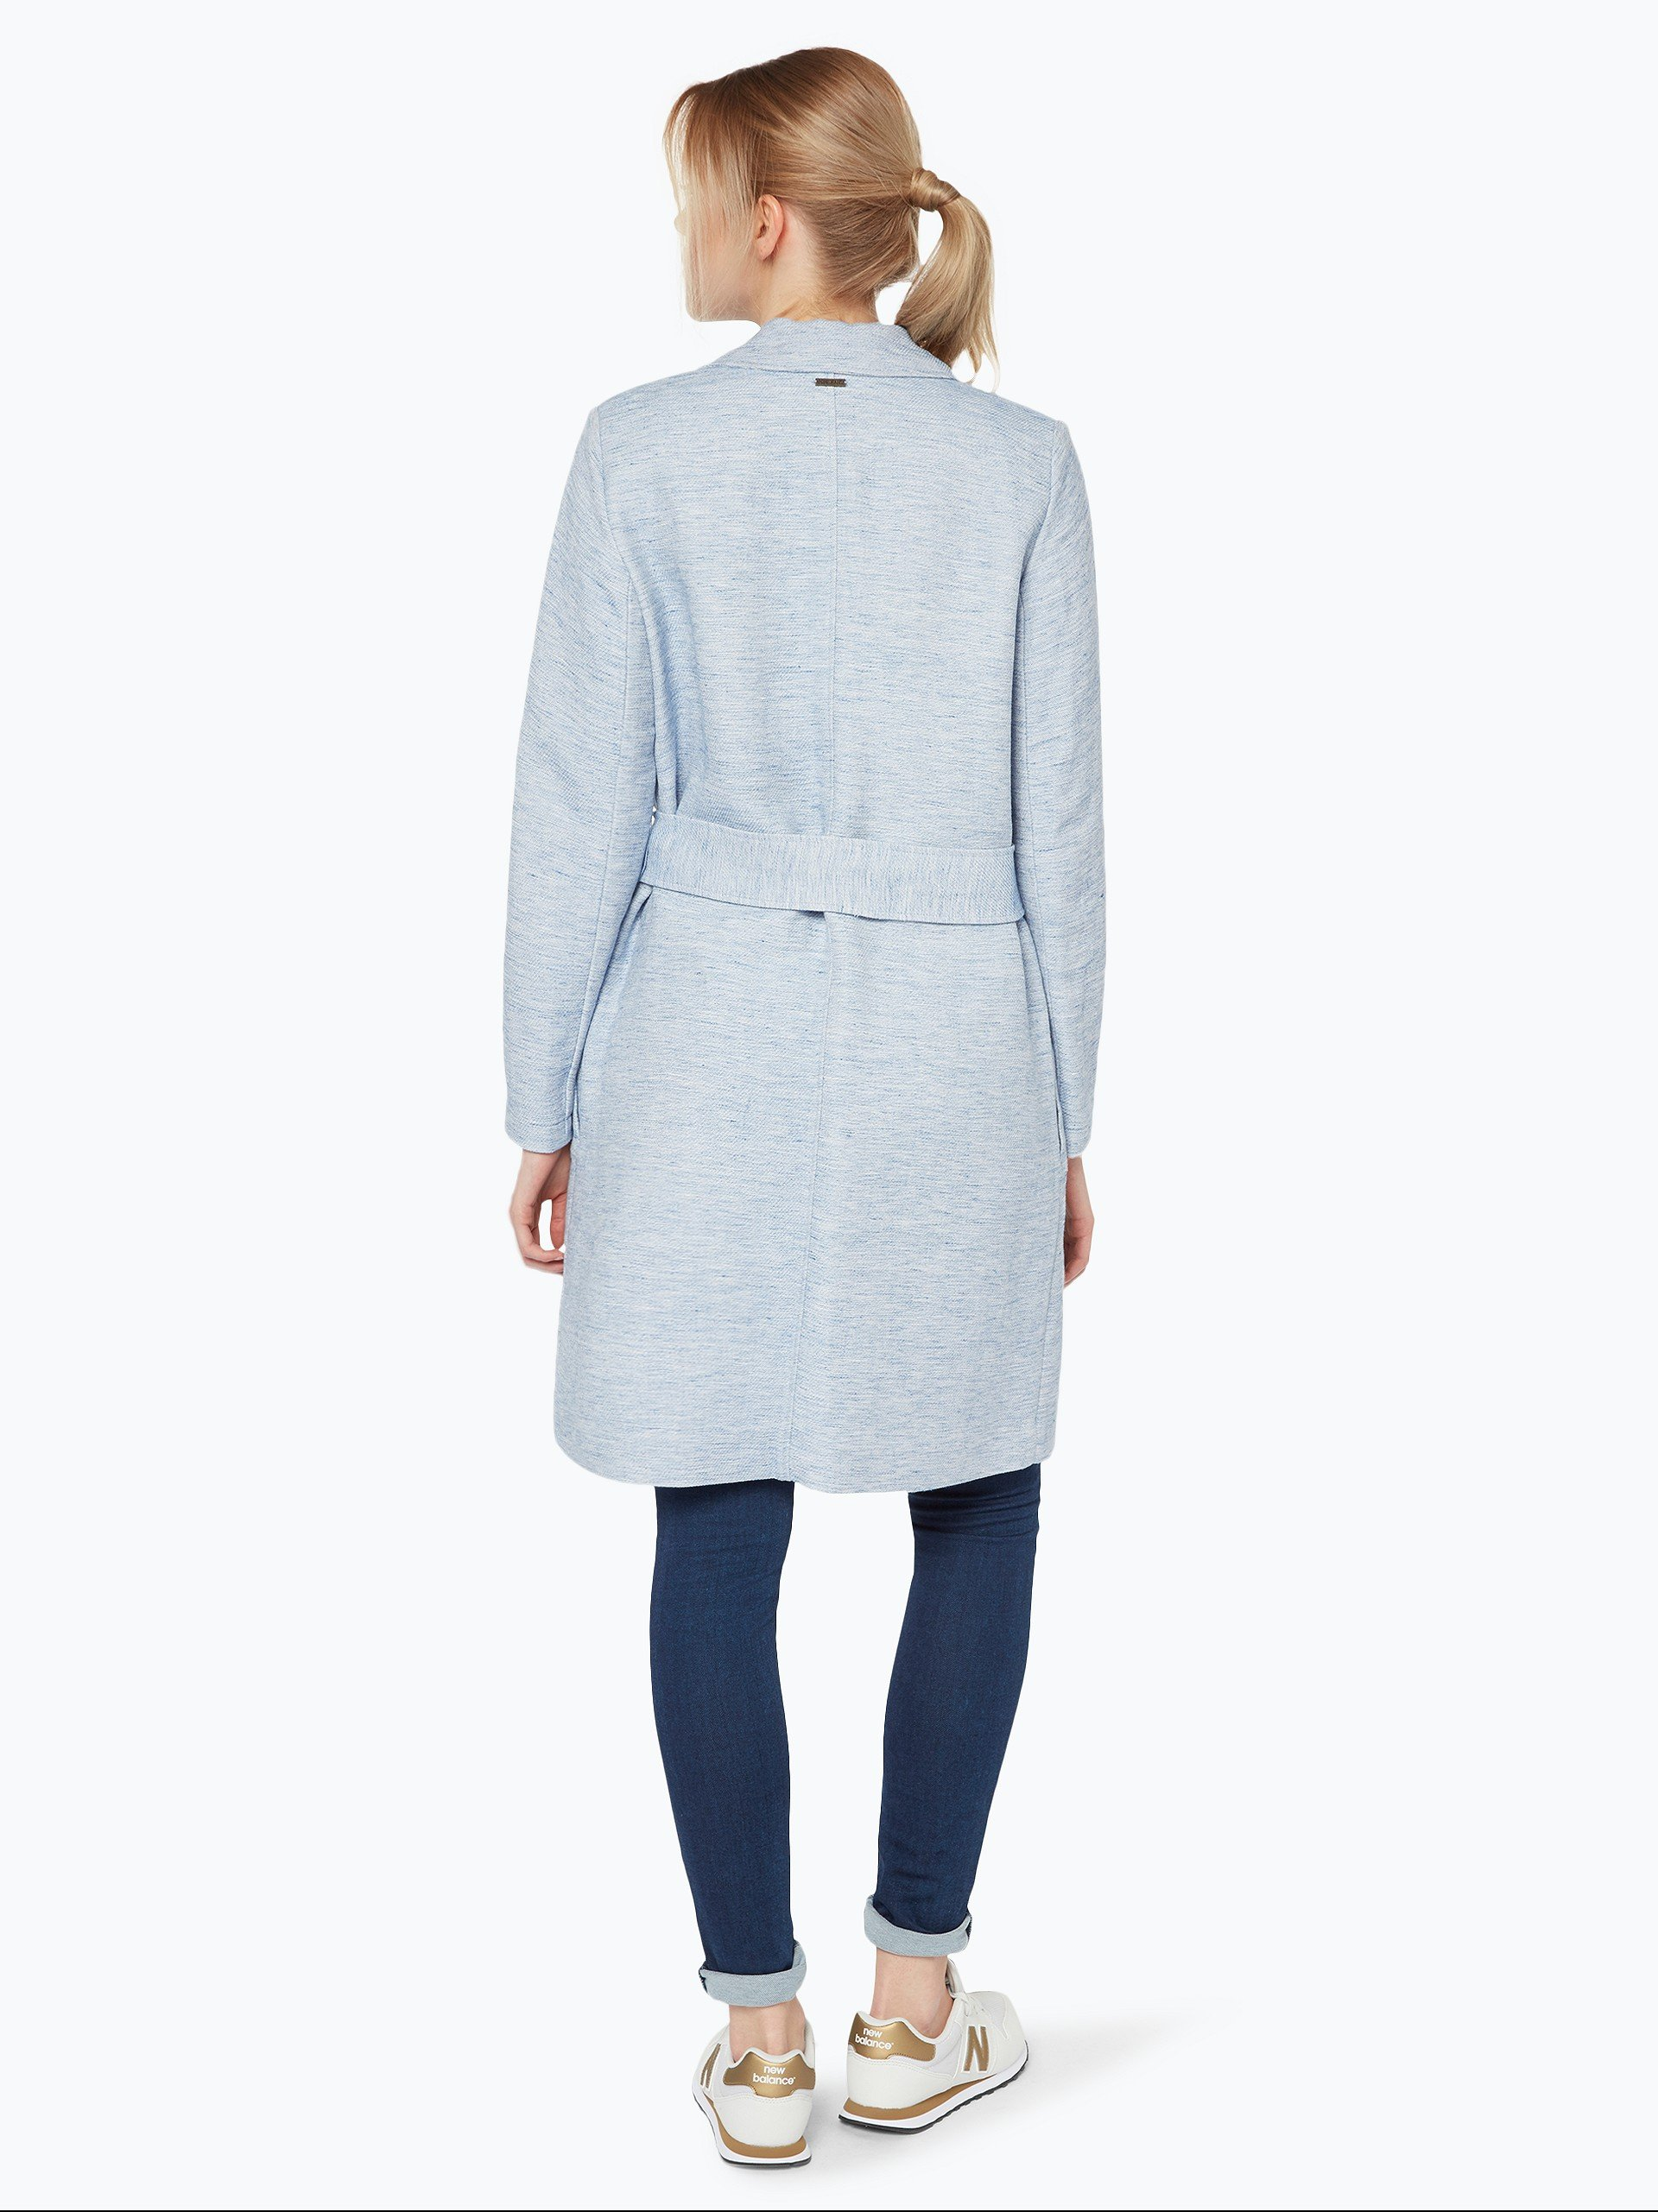 pepe jeans damen mantel mit leinen anteil karol hellblau. Black Bedroom Furniture Sets. Home Design Ideas